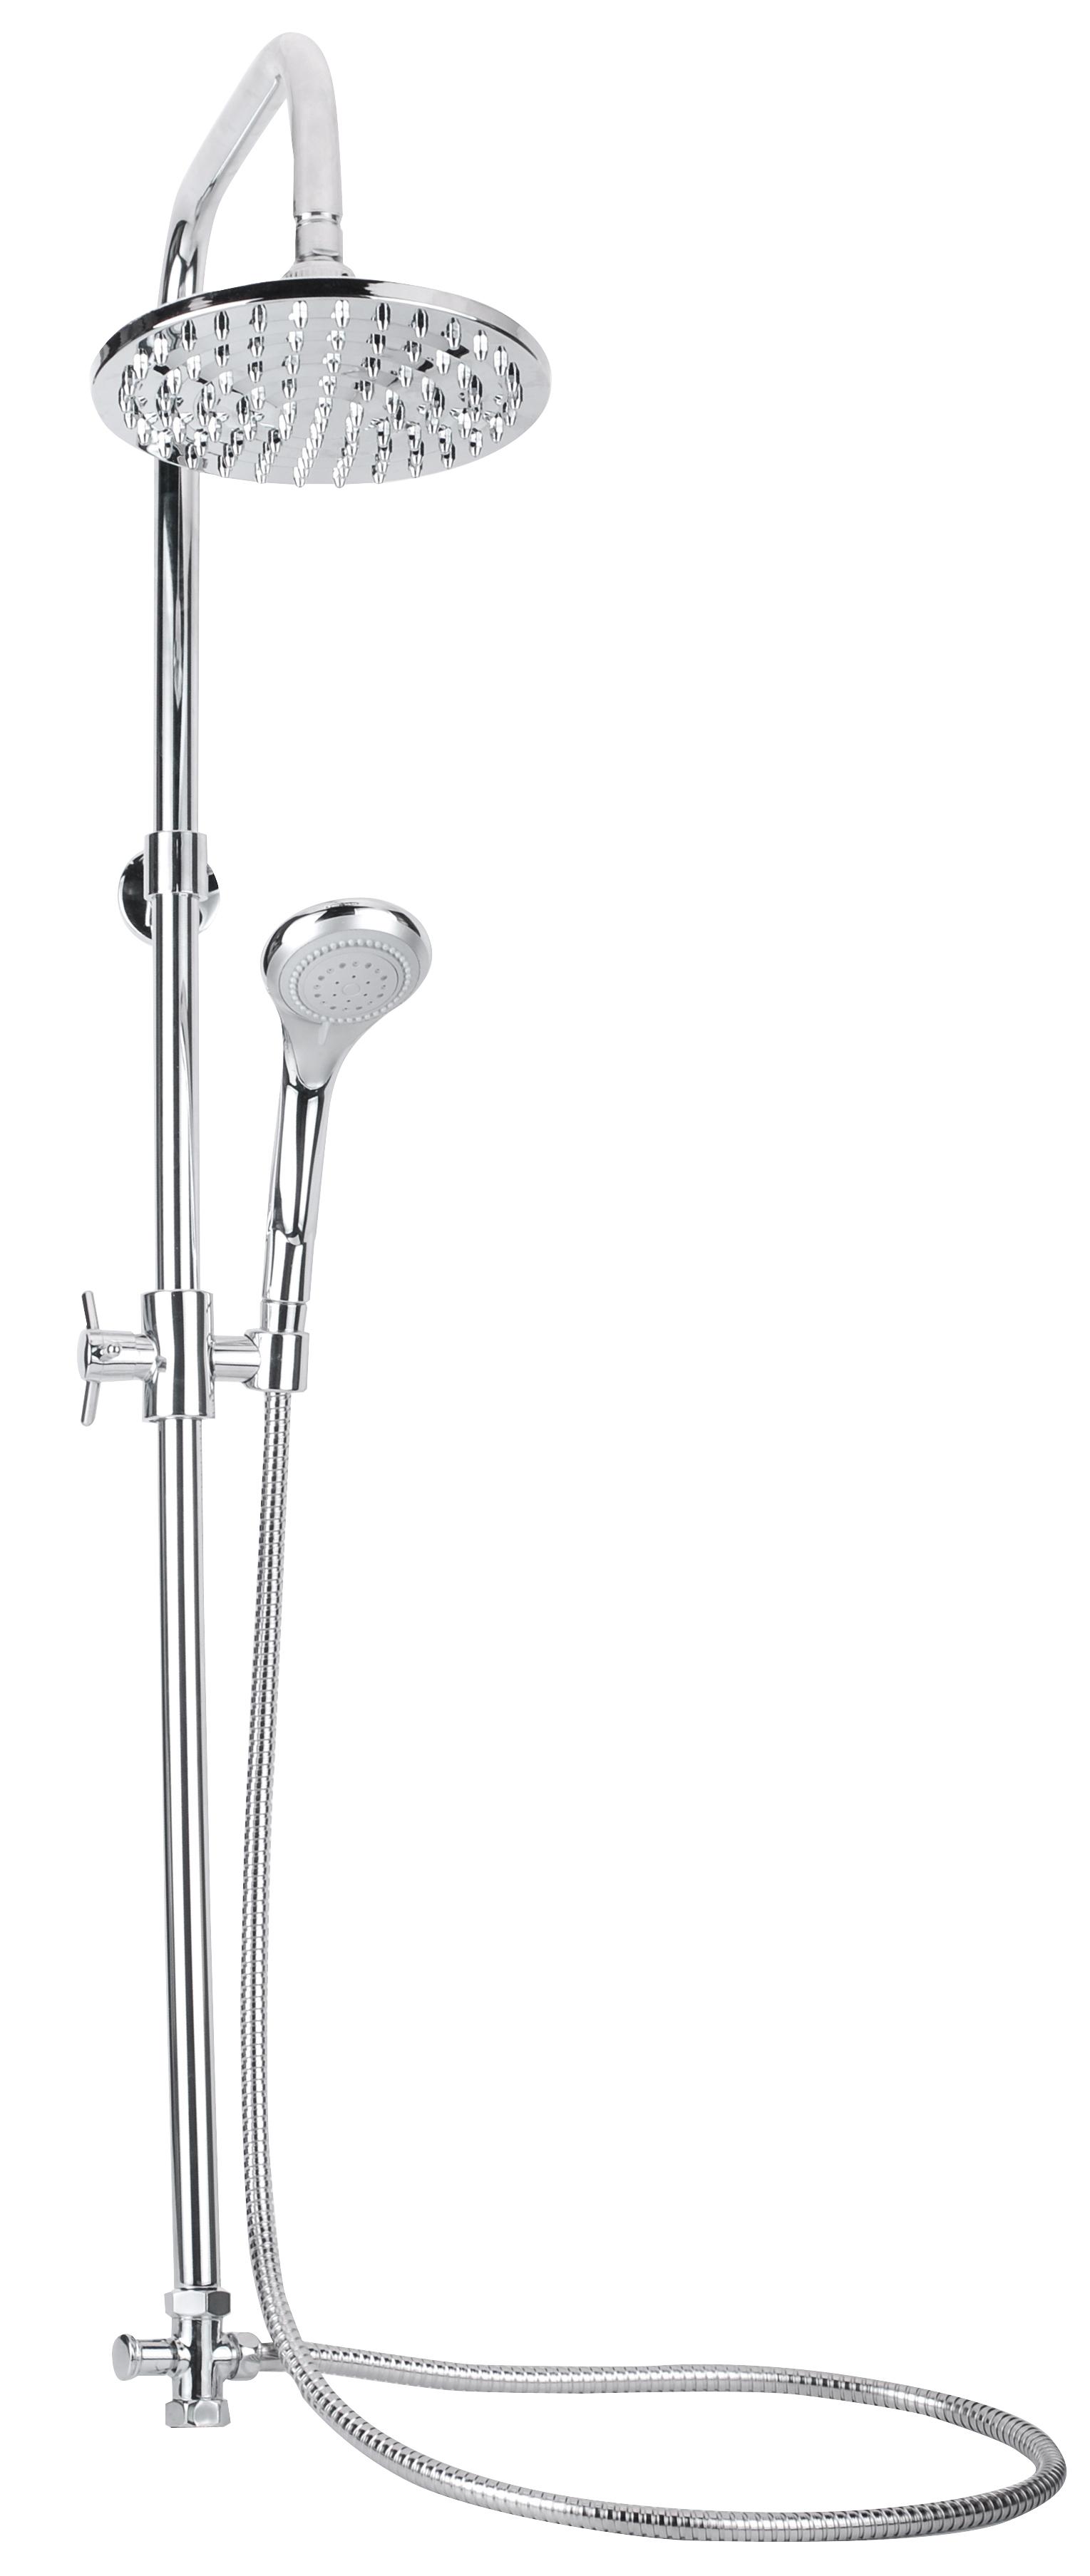 doccetta per animali cartoon//soffione doccia per bambini doccia per bambini giallo Soffione doccia